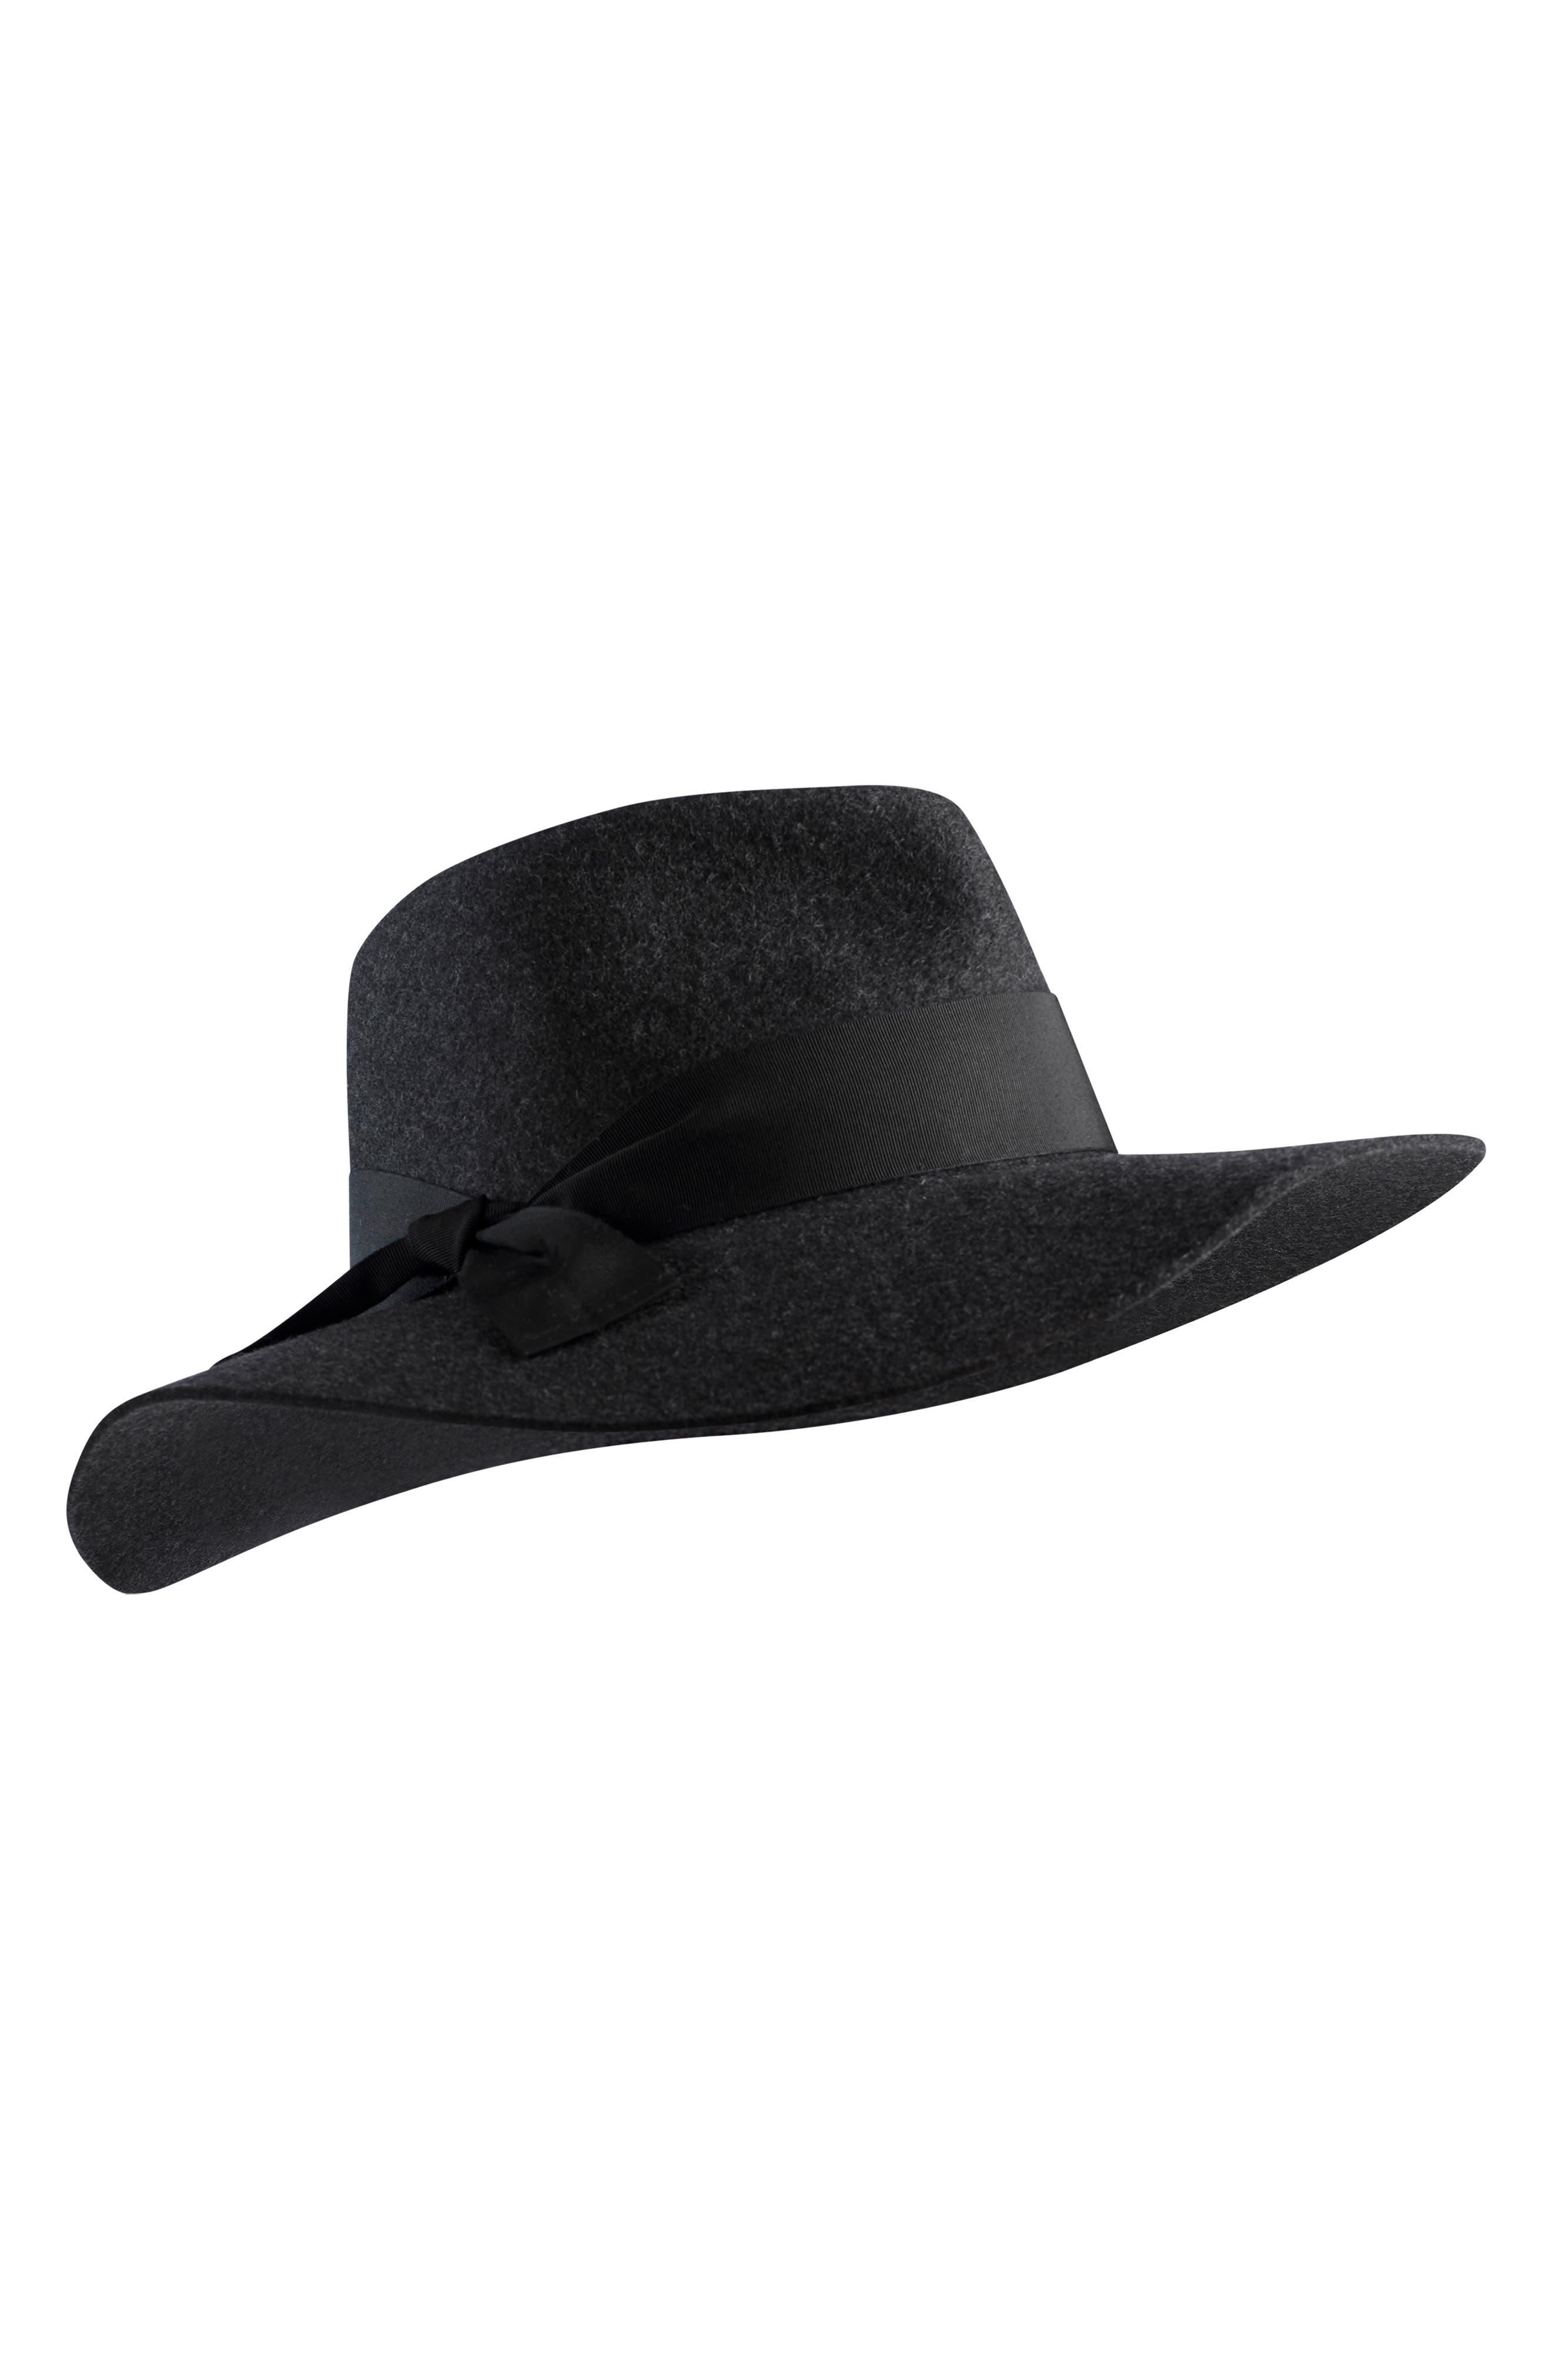 Western Wool Fedora,                         Main,                         color, KNIGHT MELANGE/ BLACK